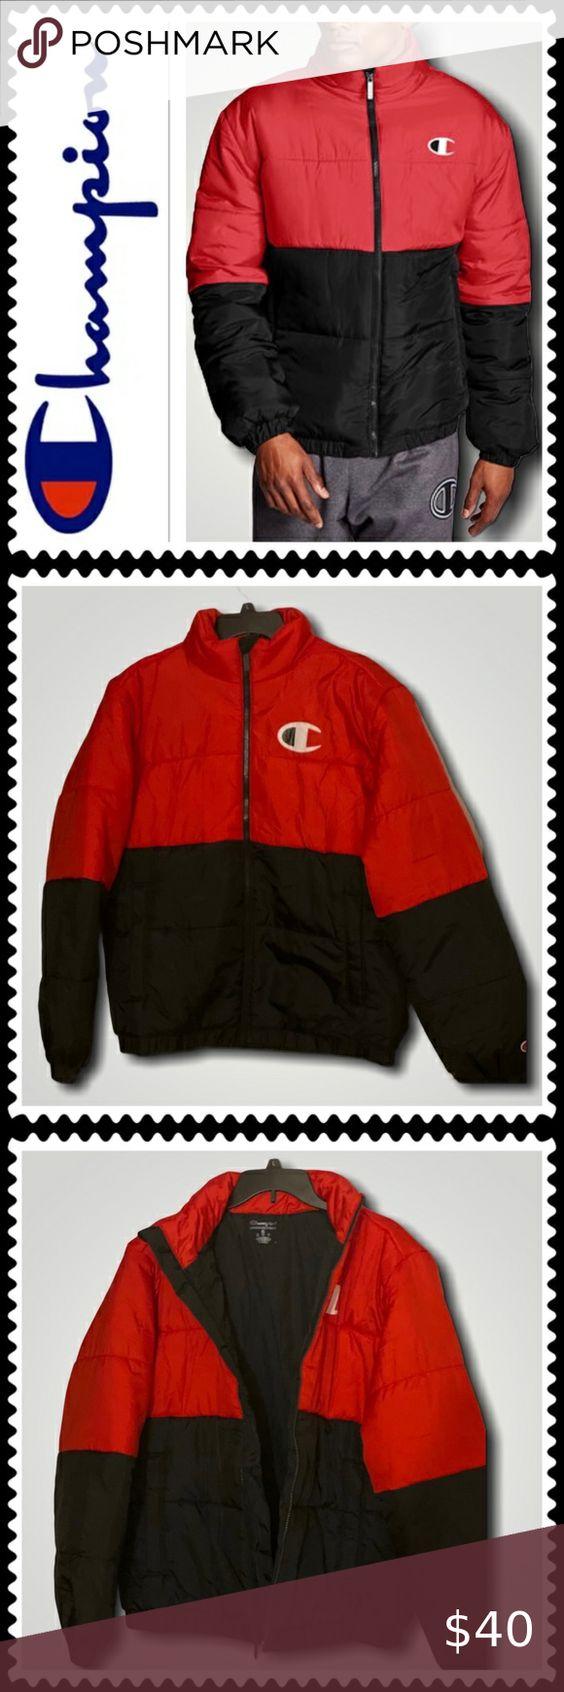 Champion Men S Stadium Puffer Jacket Mens Puffer Jacket Blue Puffer Jacket Camo Puffer Jacket [ 1692 x 564 Pixel ]